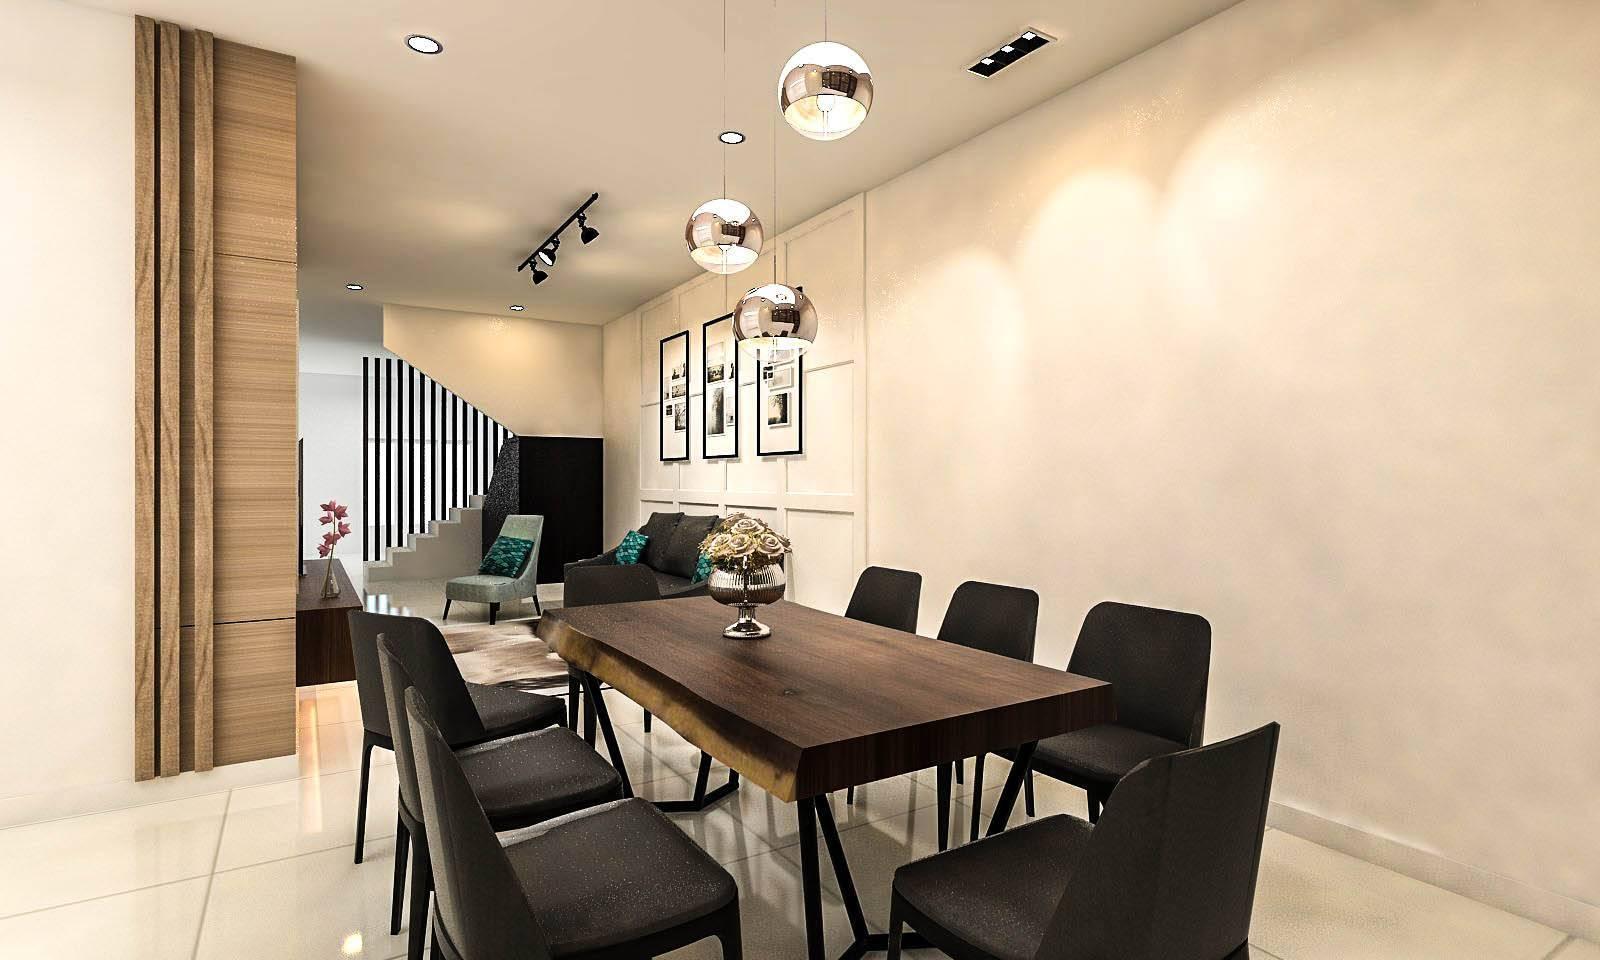 Graharupa Cipta Kirana Pluit Residence Pluit Sakti Pluit Sakti Dining Room Modern  6807